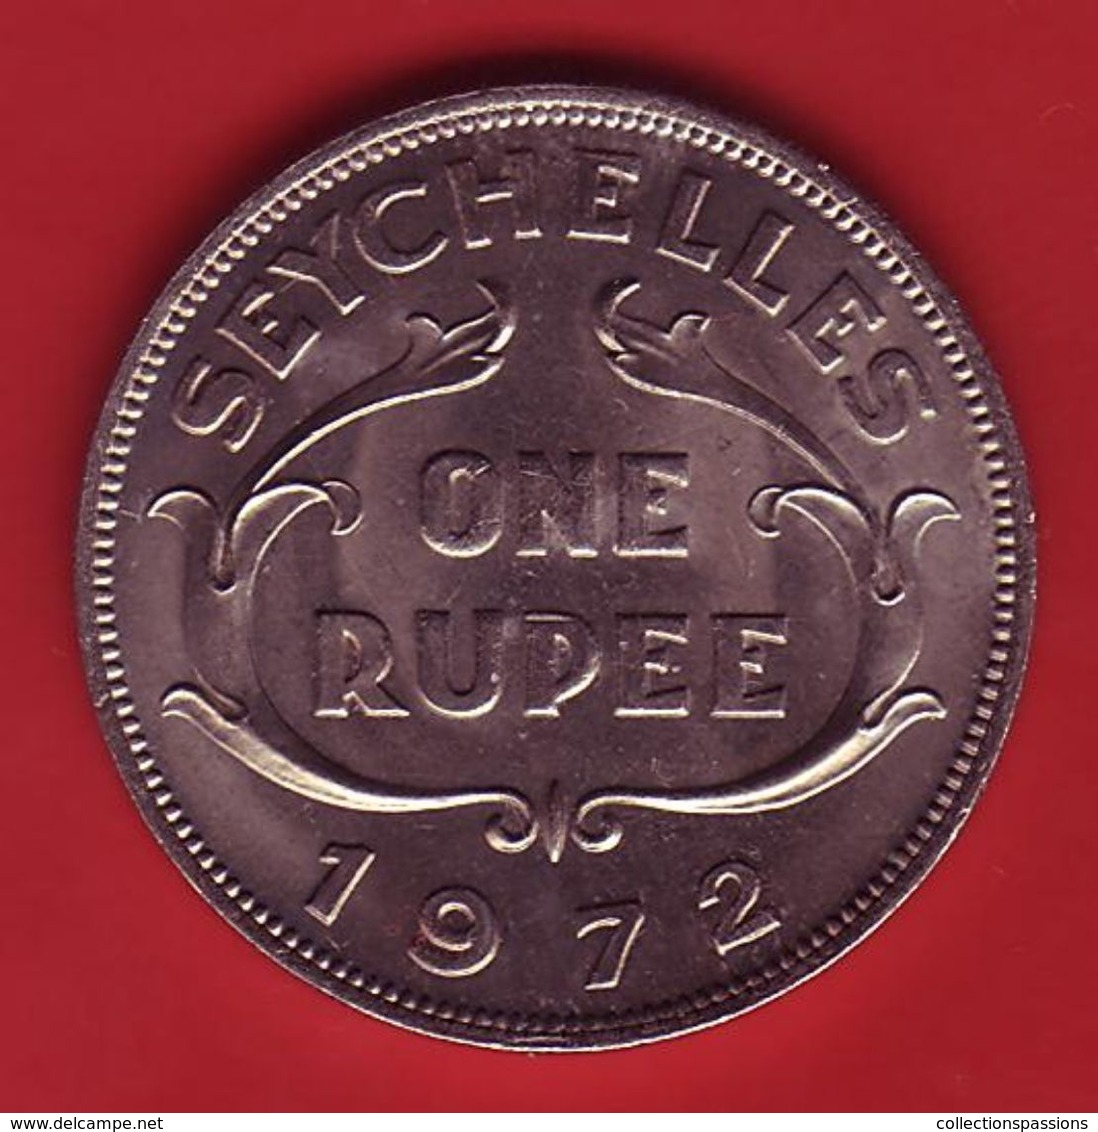 - SEYCHELLES - One Rupee - 1972 - - Seychelles